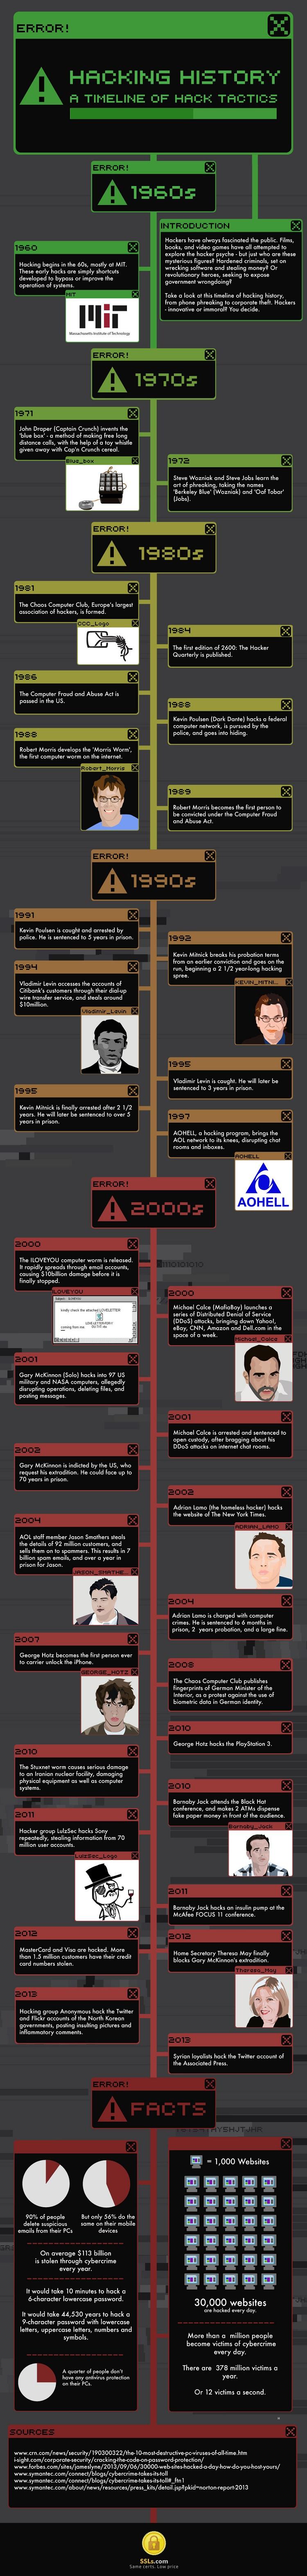 hacking-history-infografic-histoire-piratage-infographie [750 x 6285]